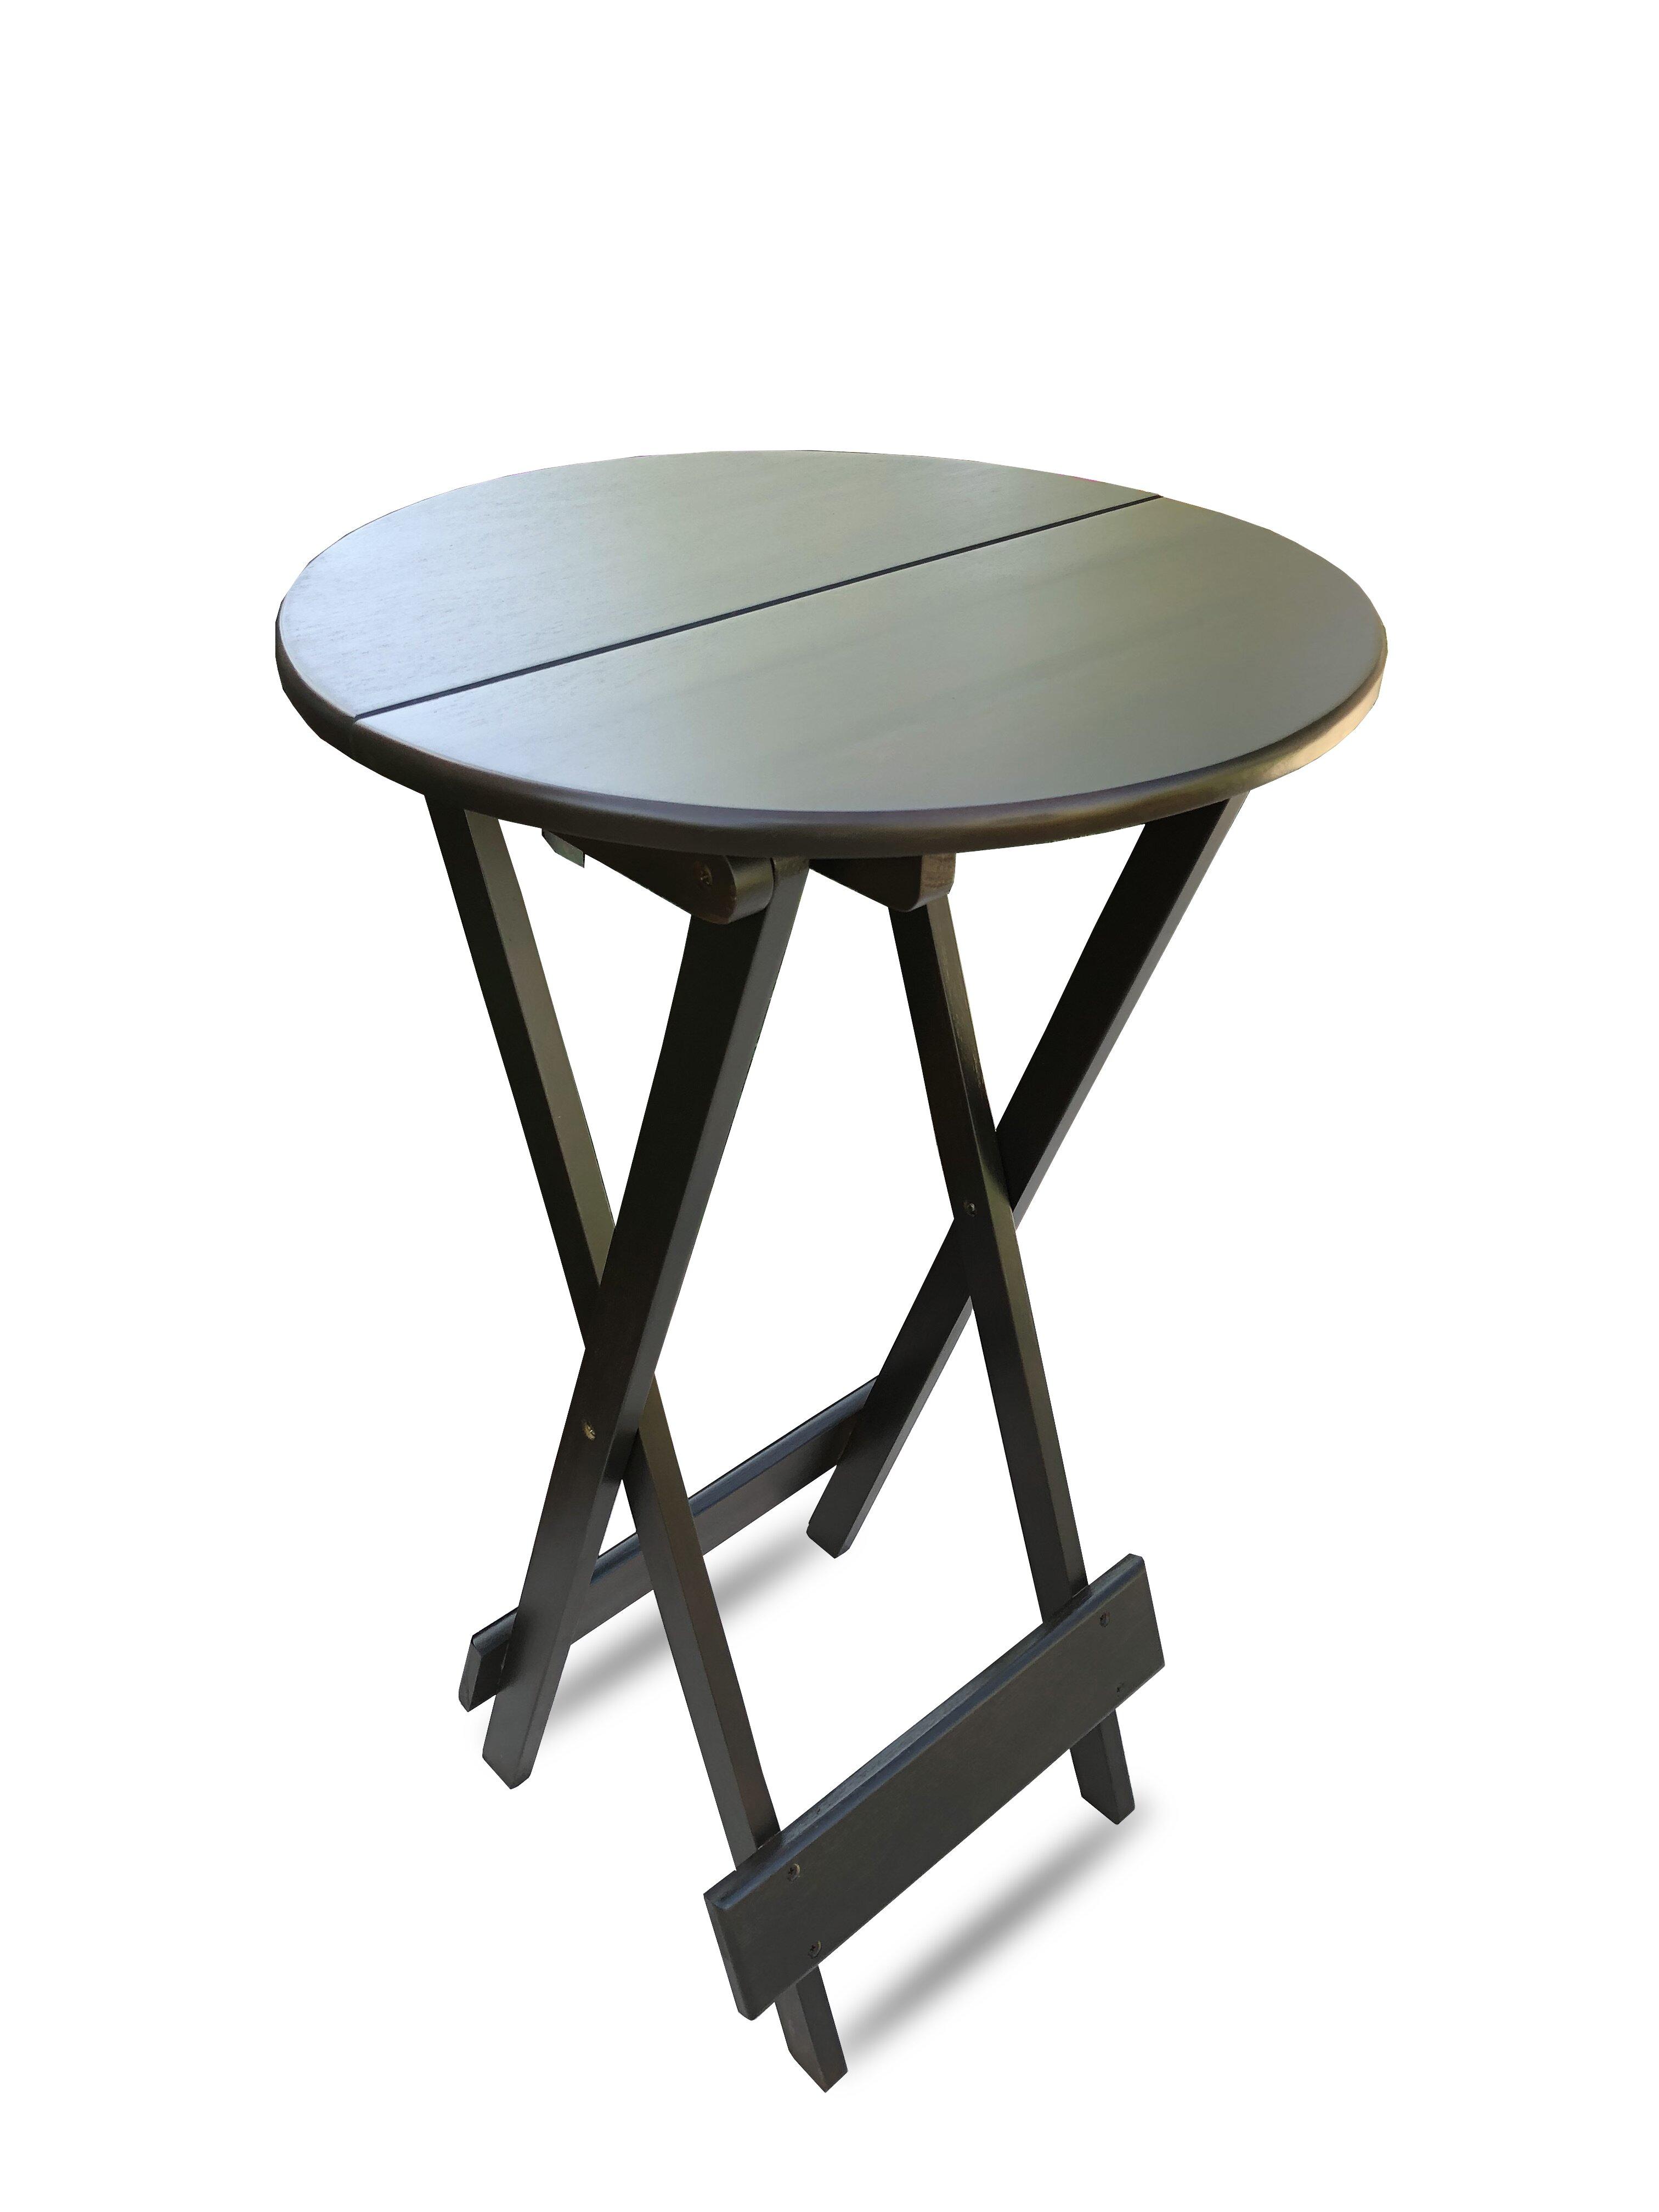 Primewaydecor bar height 215 circular folding table wayfair watchthetrailerfo